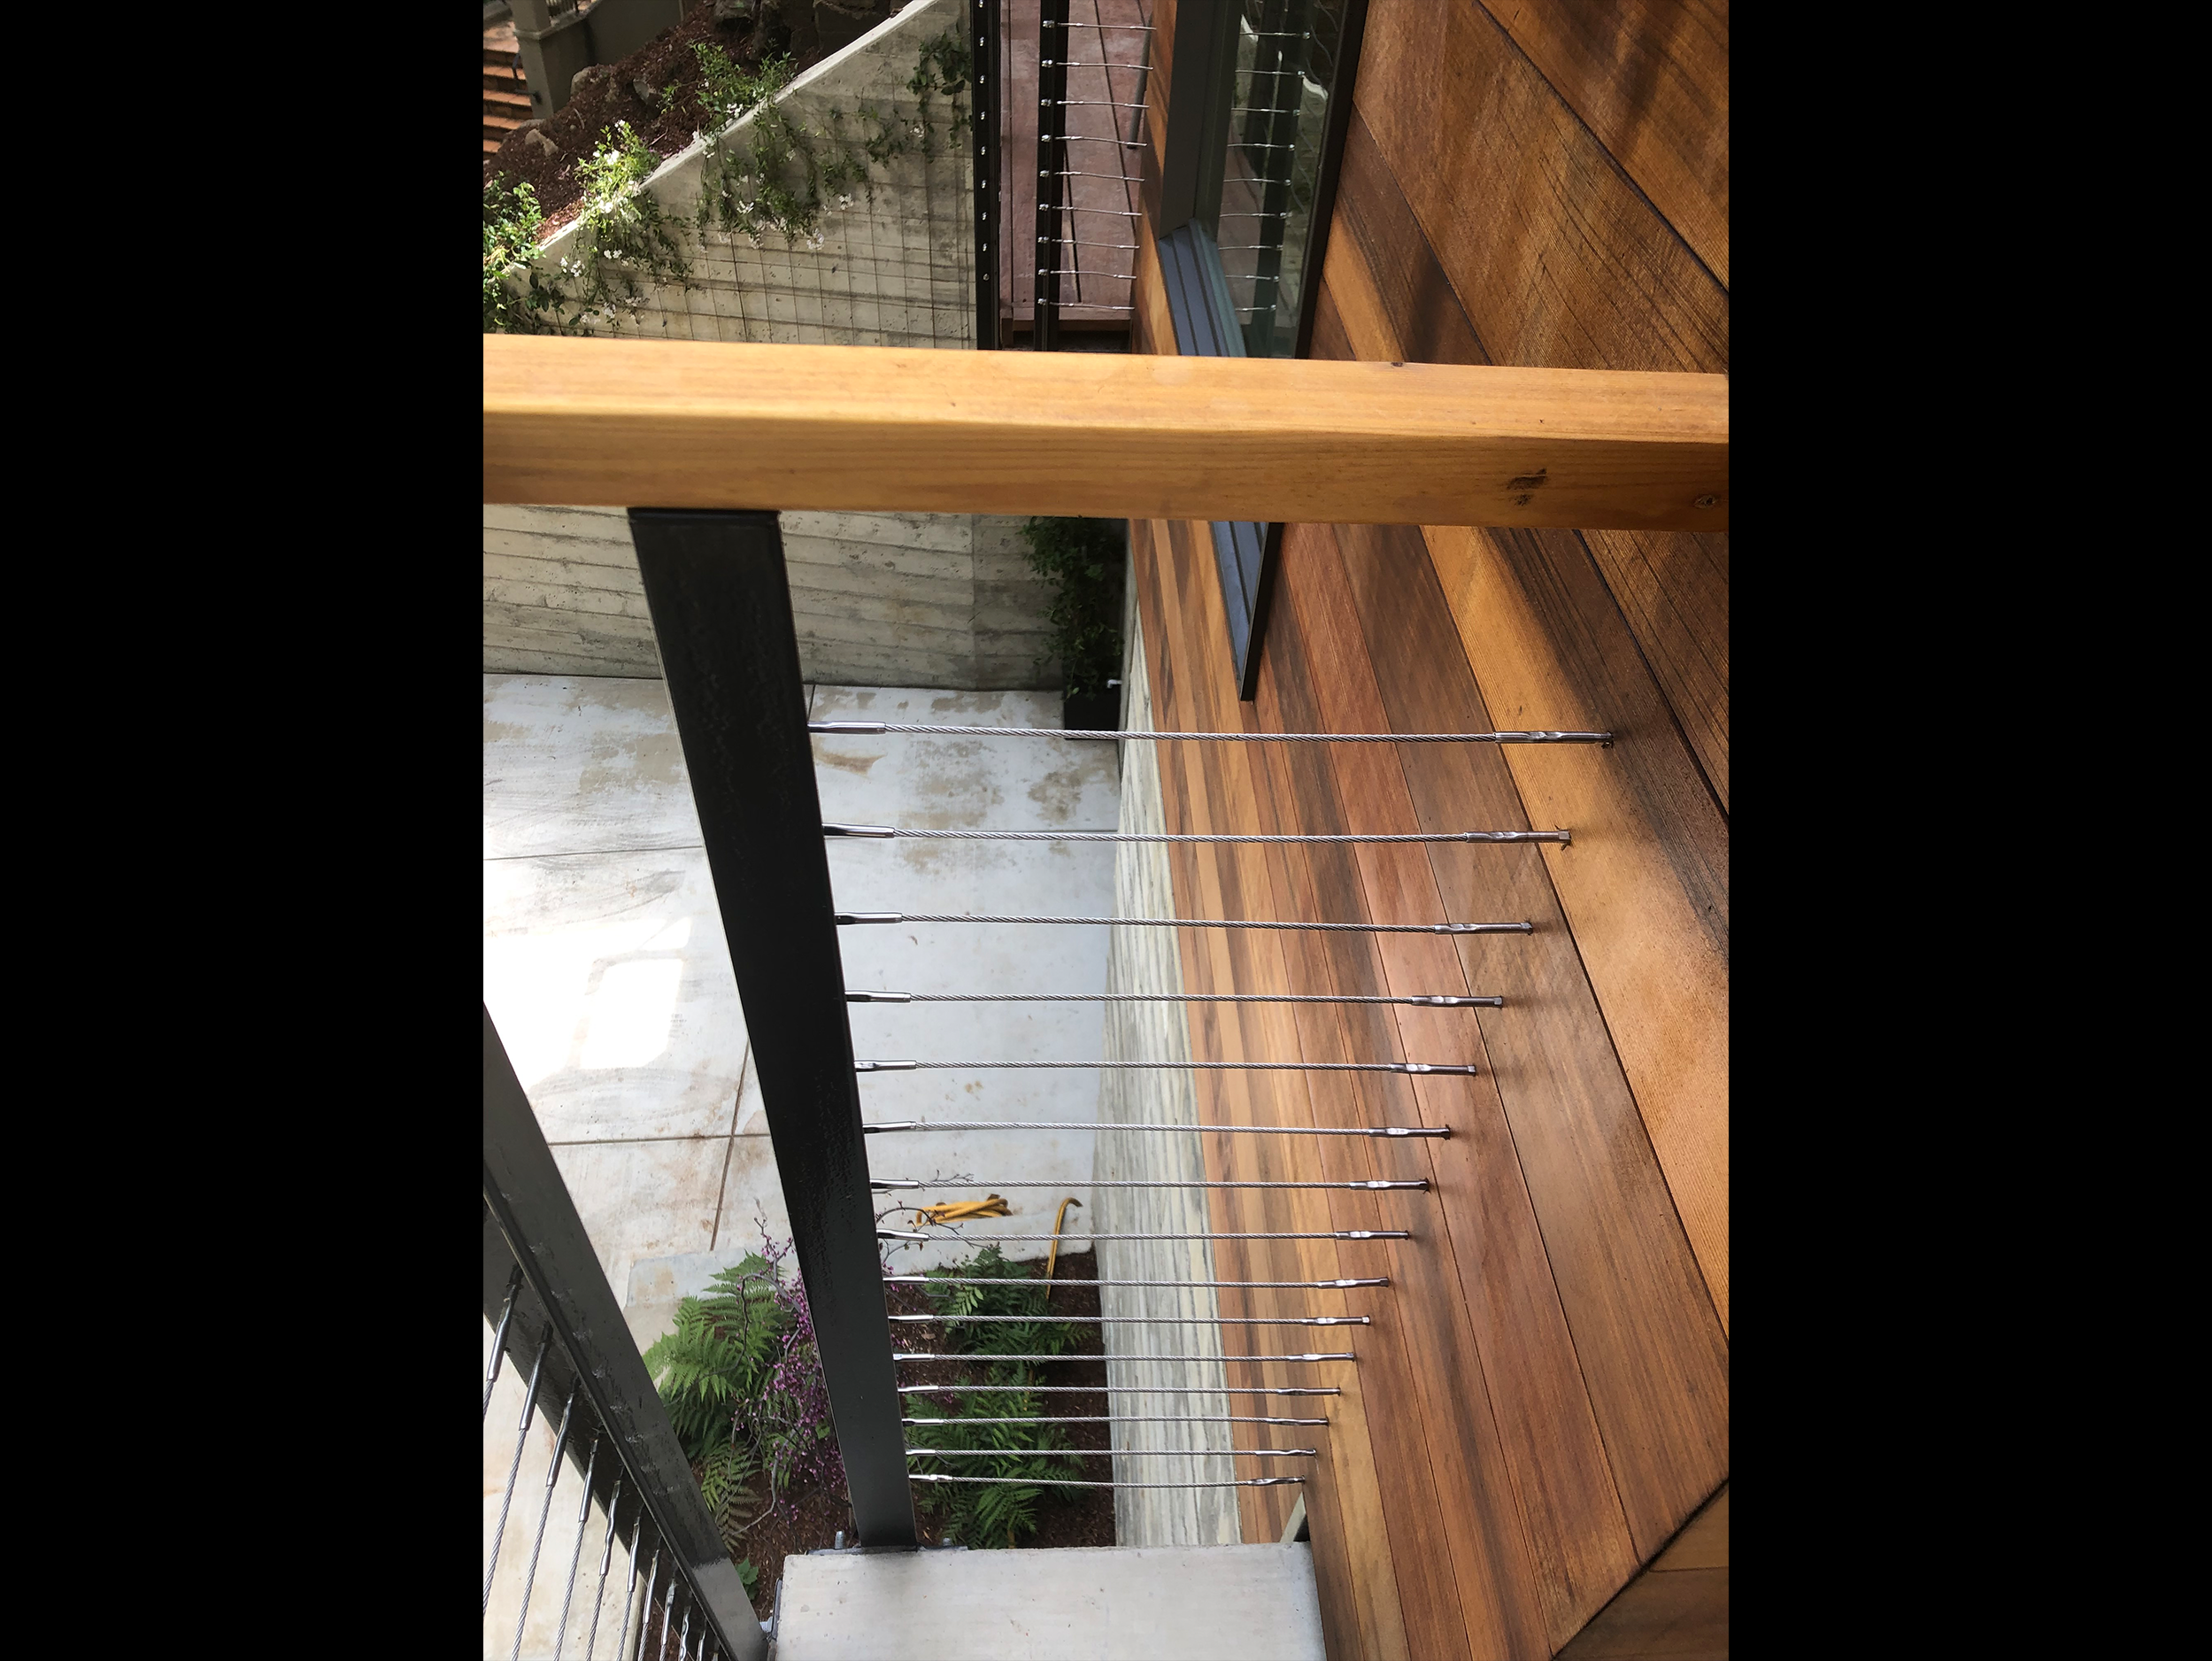 detail the turn railing